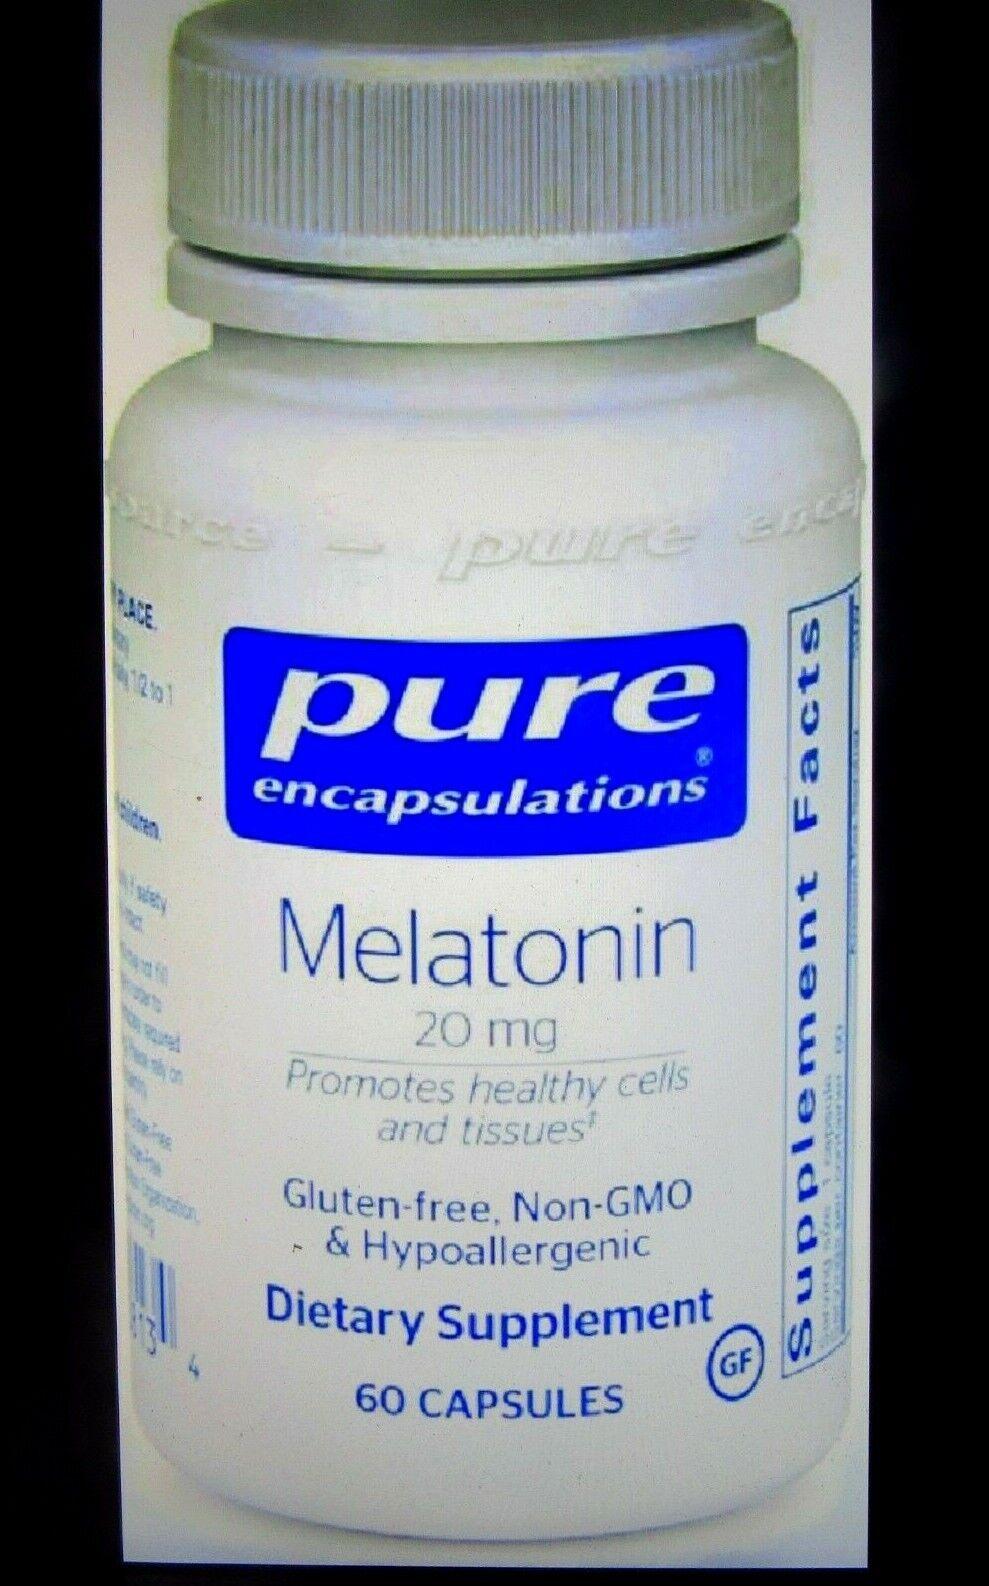 Pure Encapsulations  Melatonin 20 mg Hypoallergenic Sleeping Aid 60 Capsules